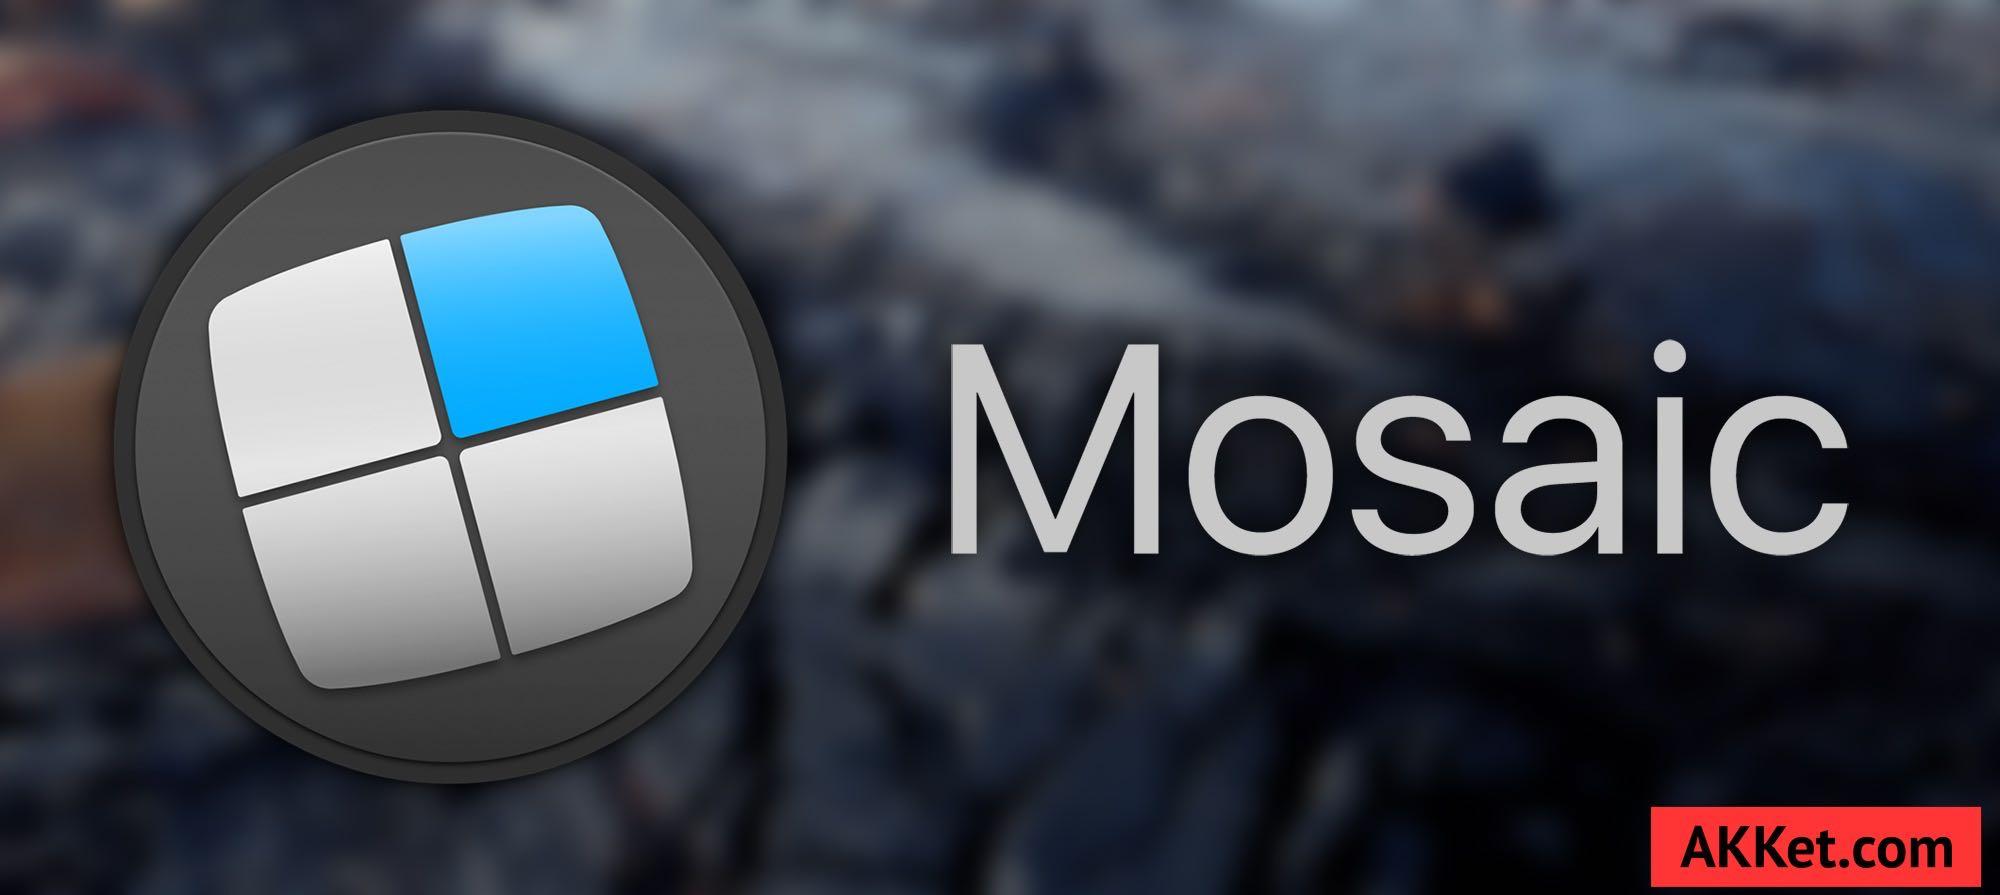 Mosaic Mac App Window Tidy Download review 12